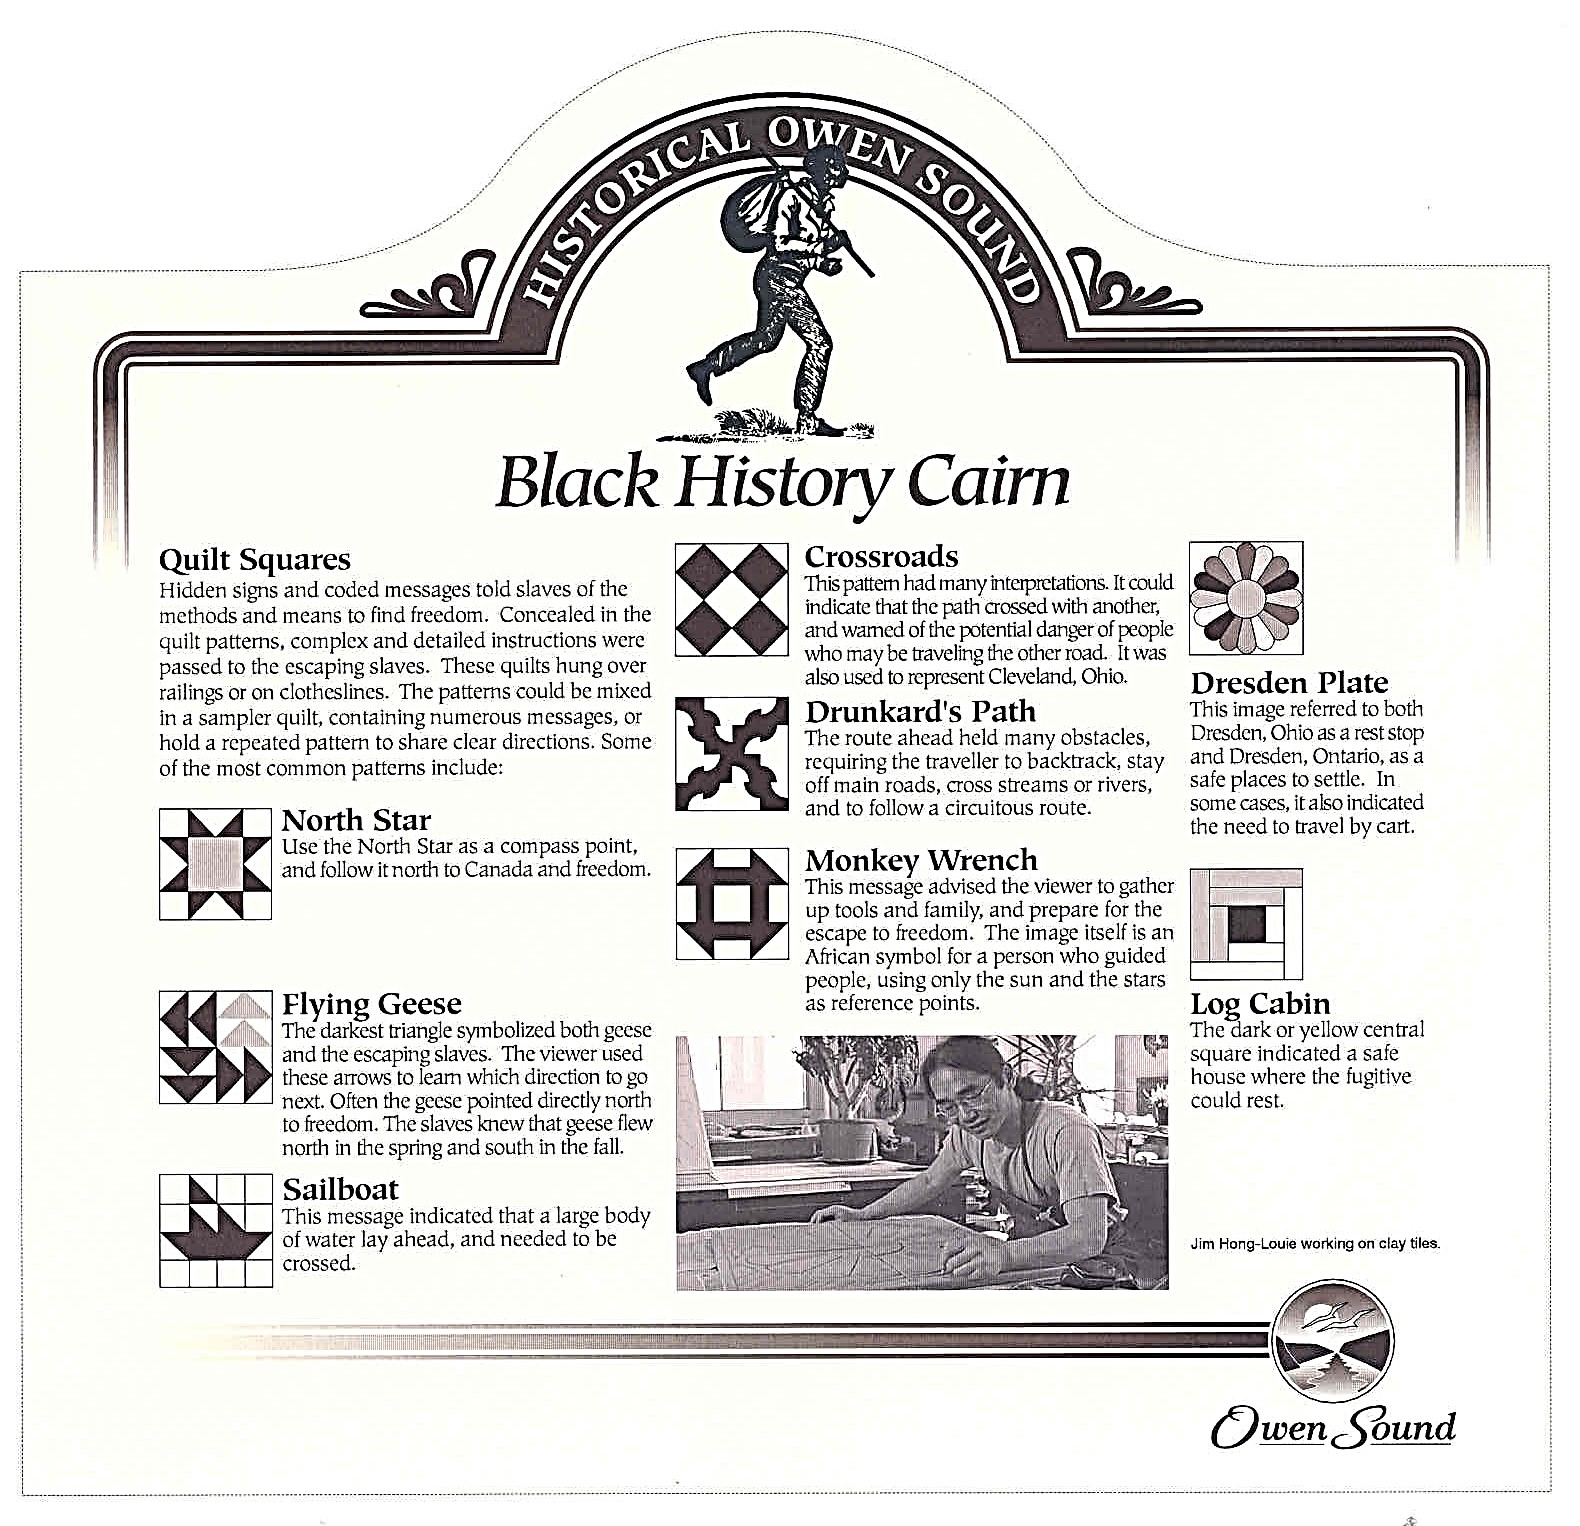 2004_BlackHistoryCairn2plaque_sharp.jpg